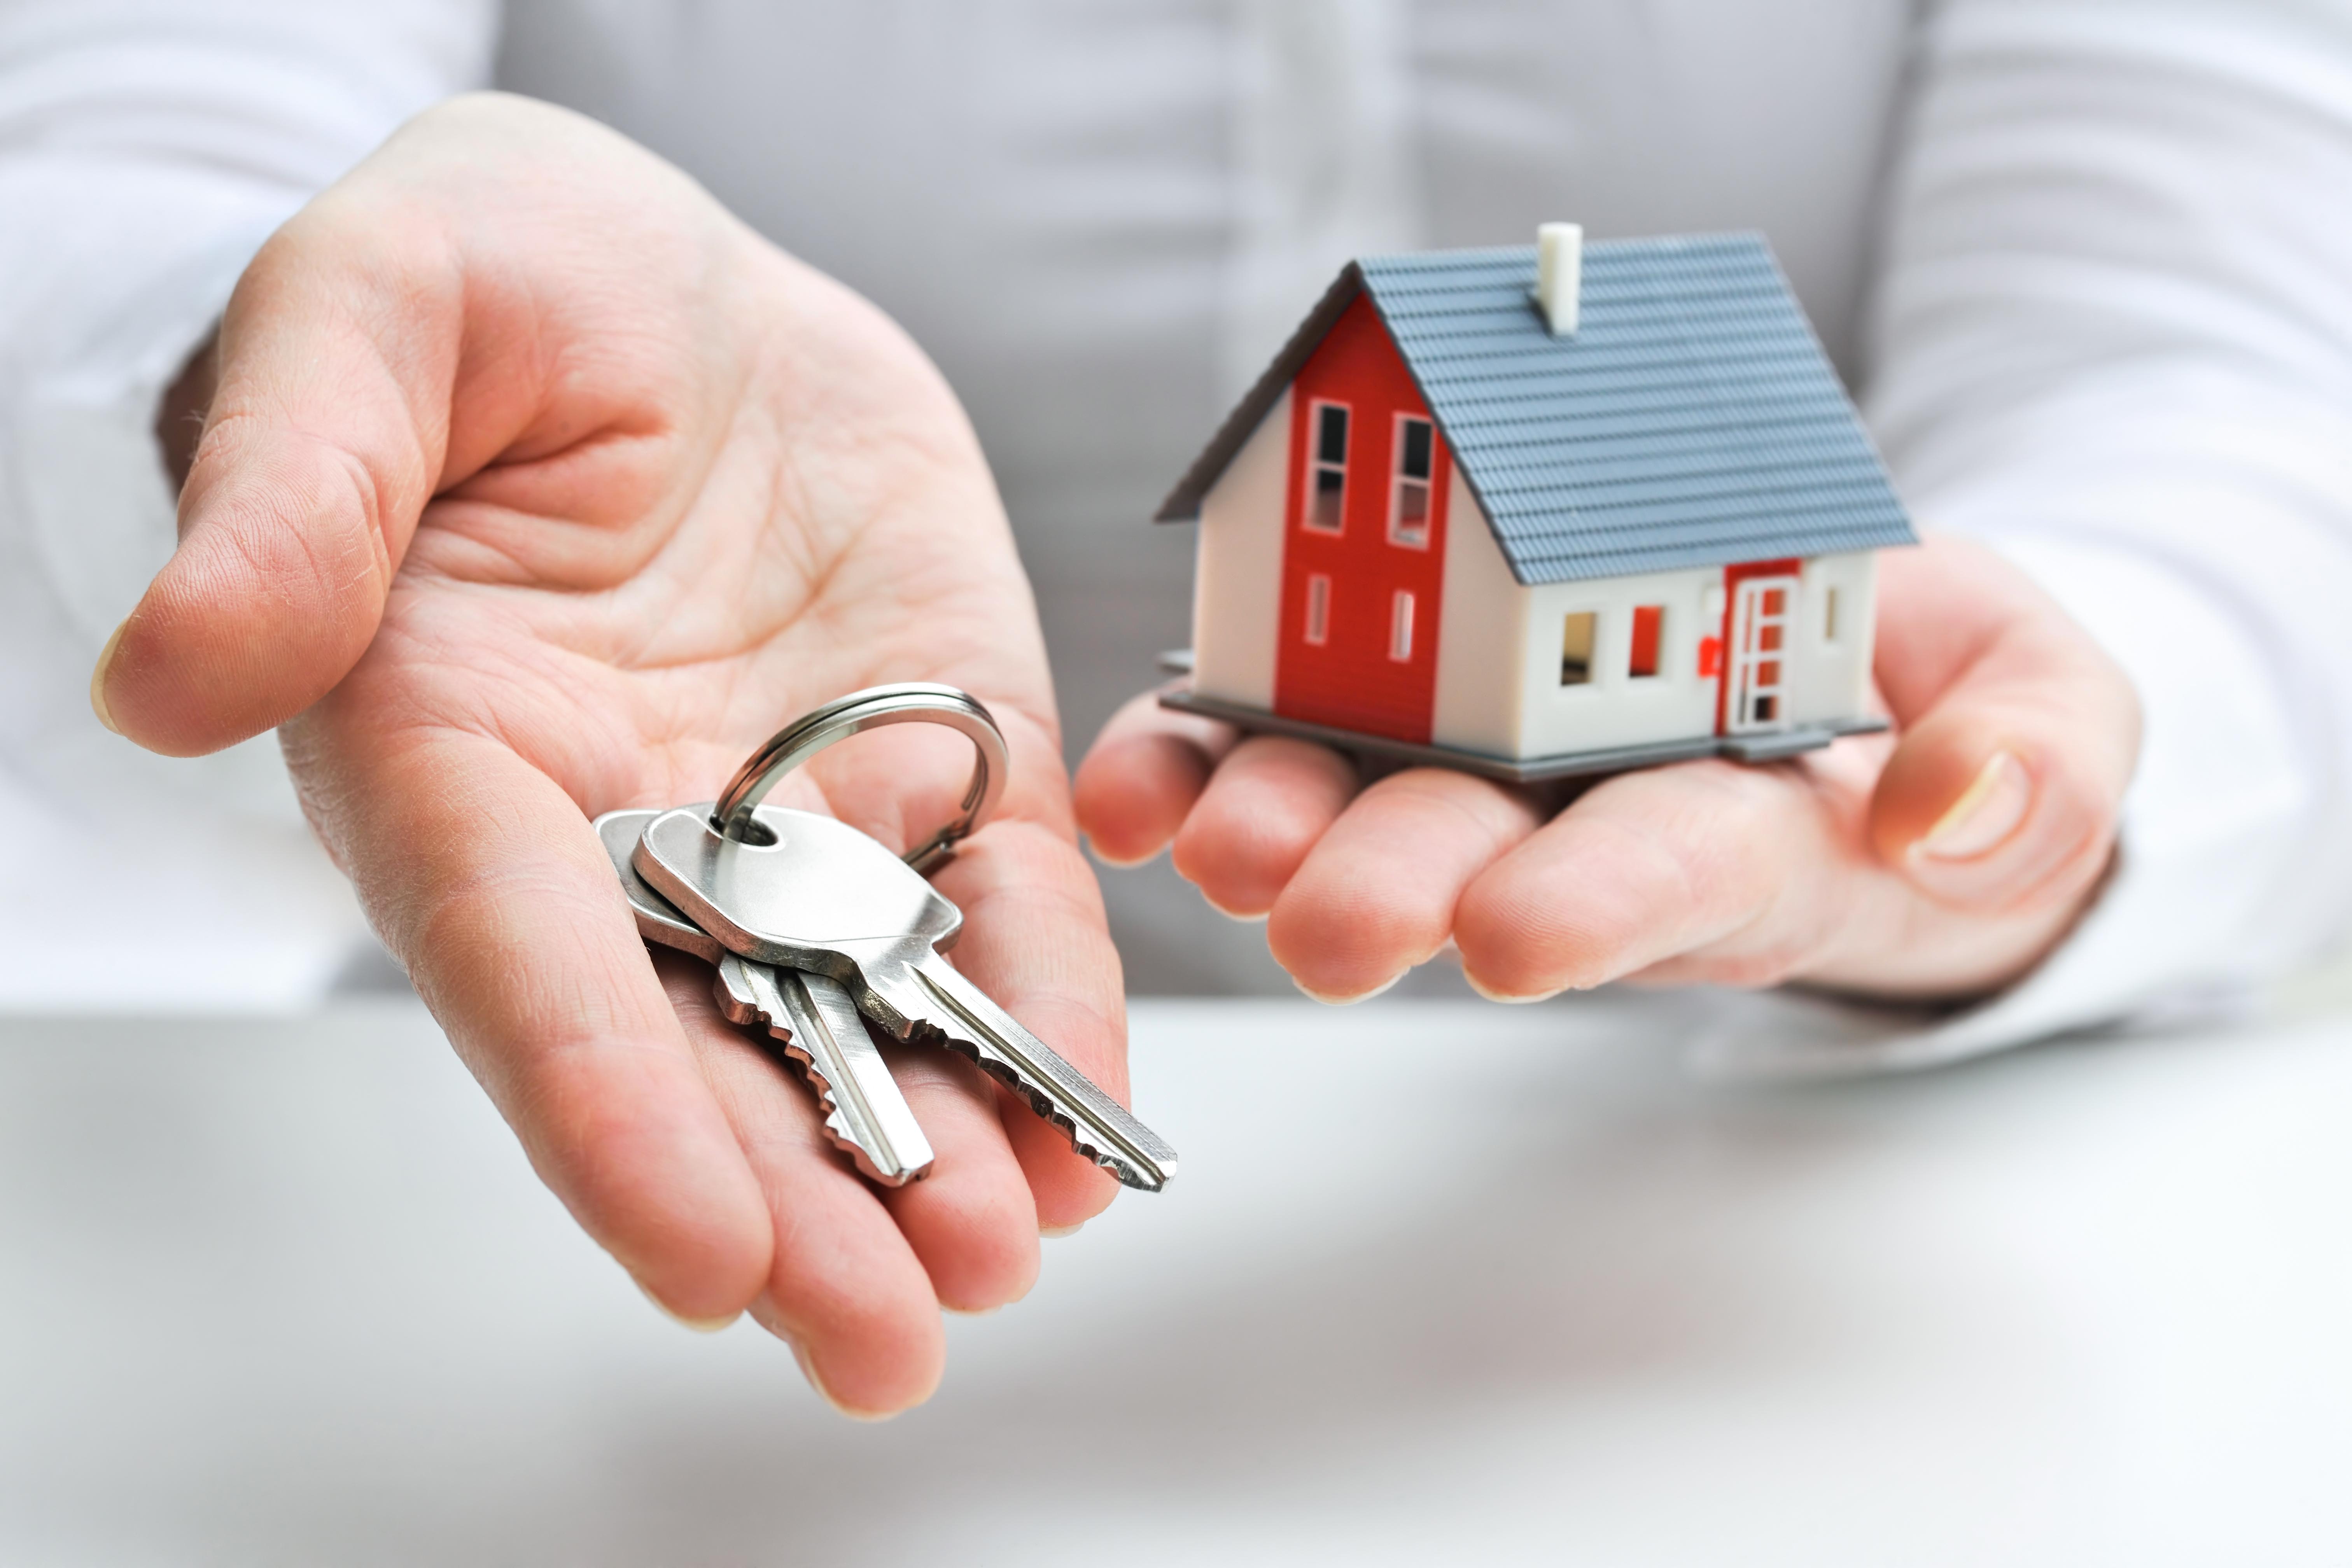 House, keys, hand